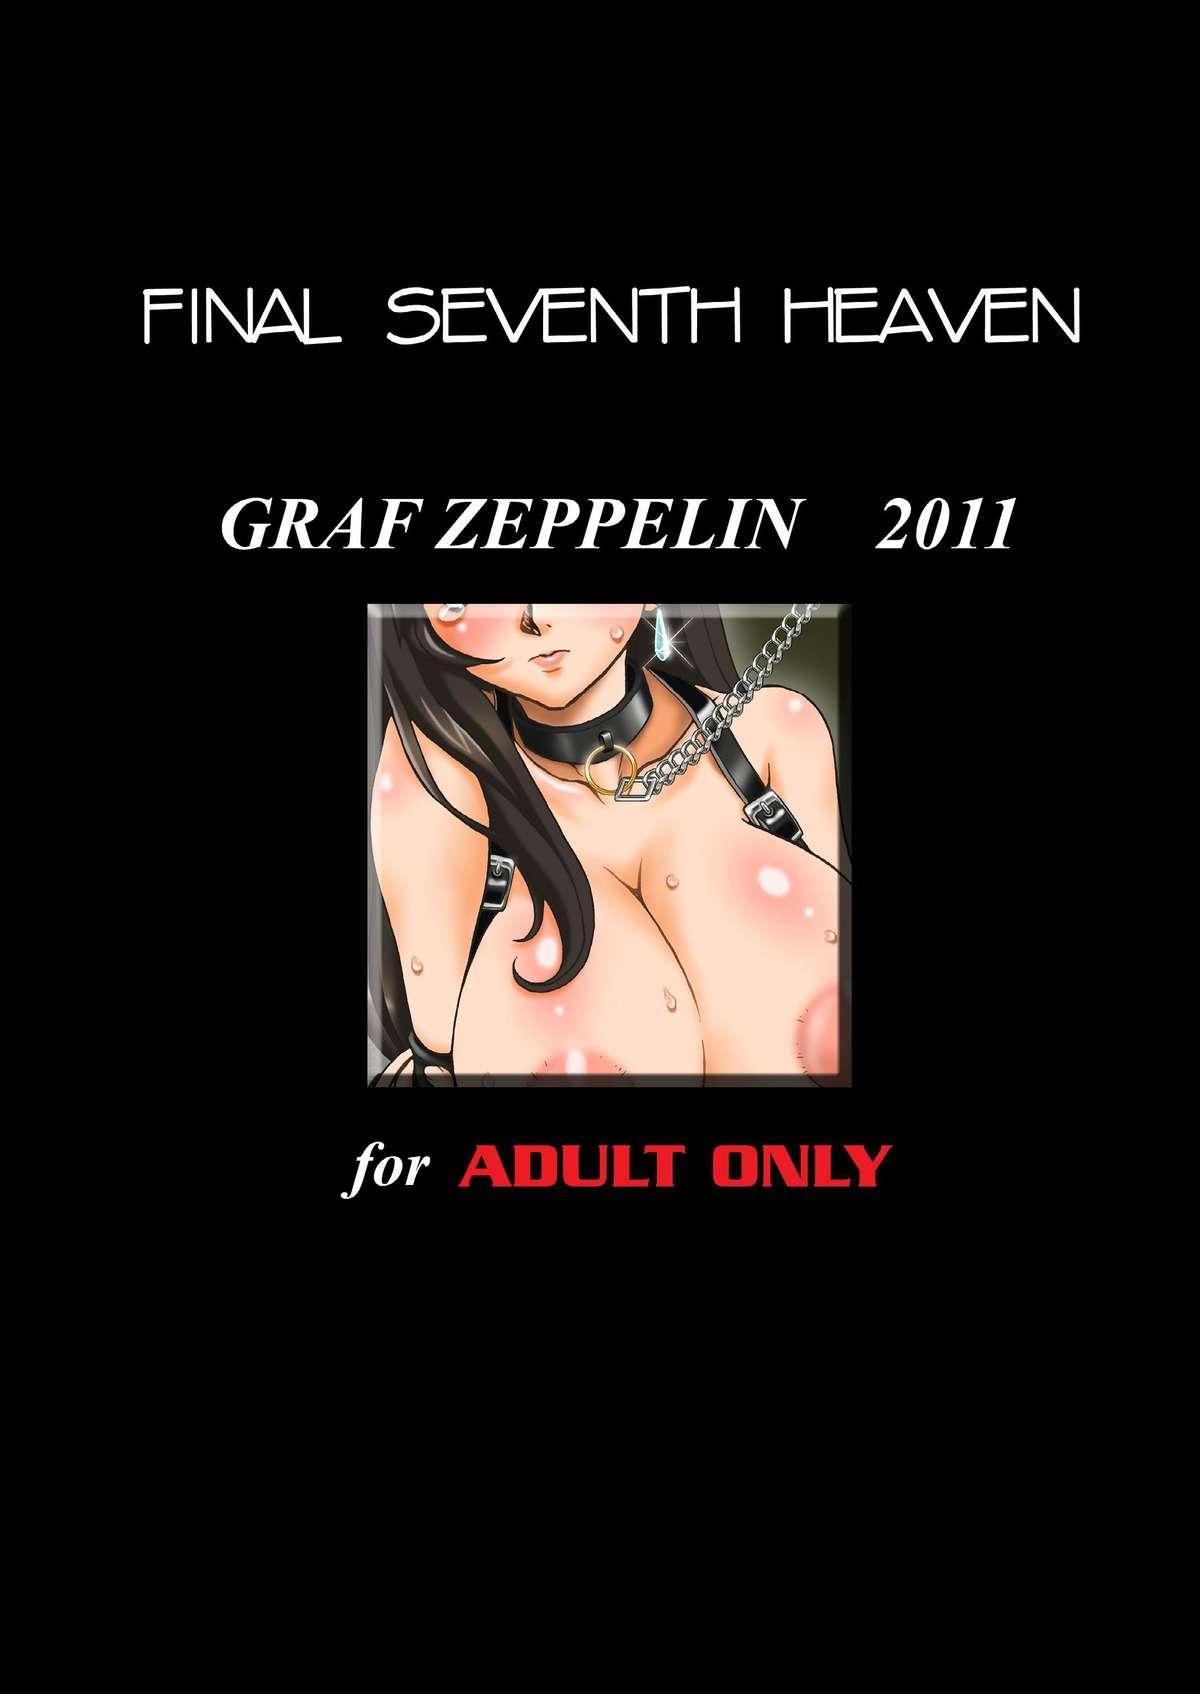 Final Seventh Heaven 24